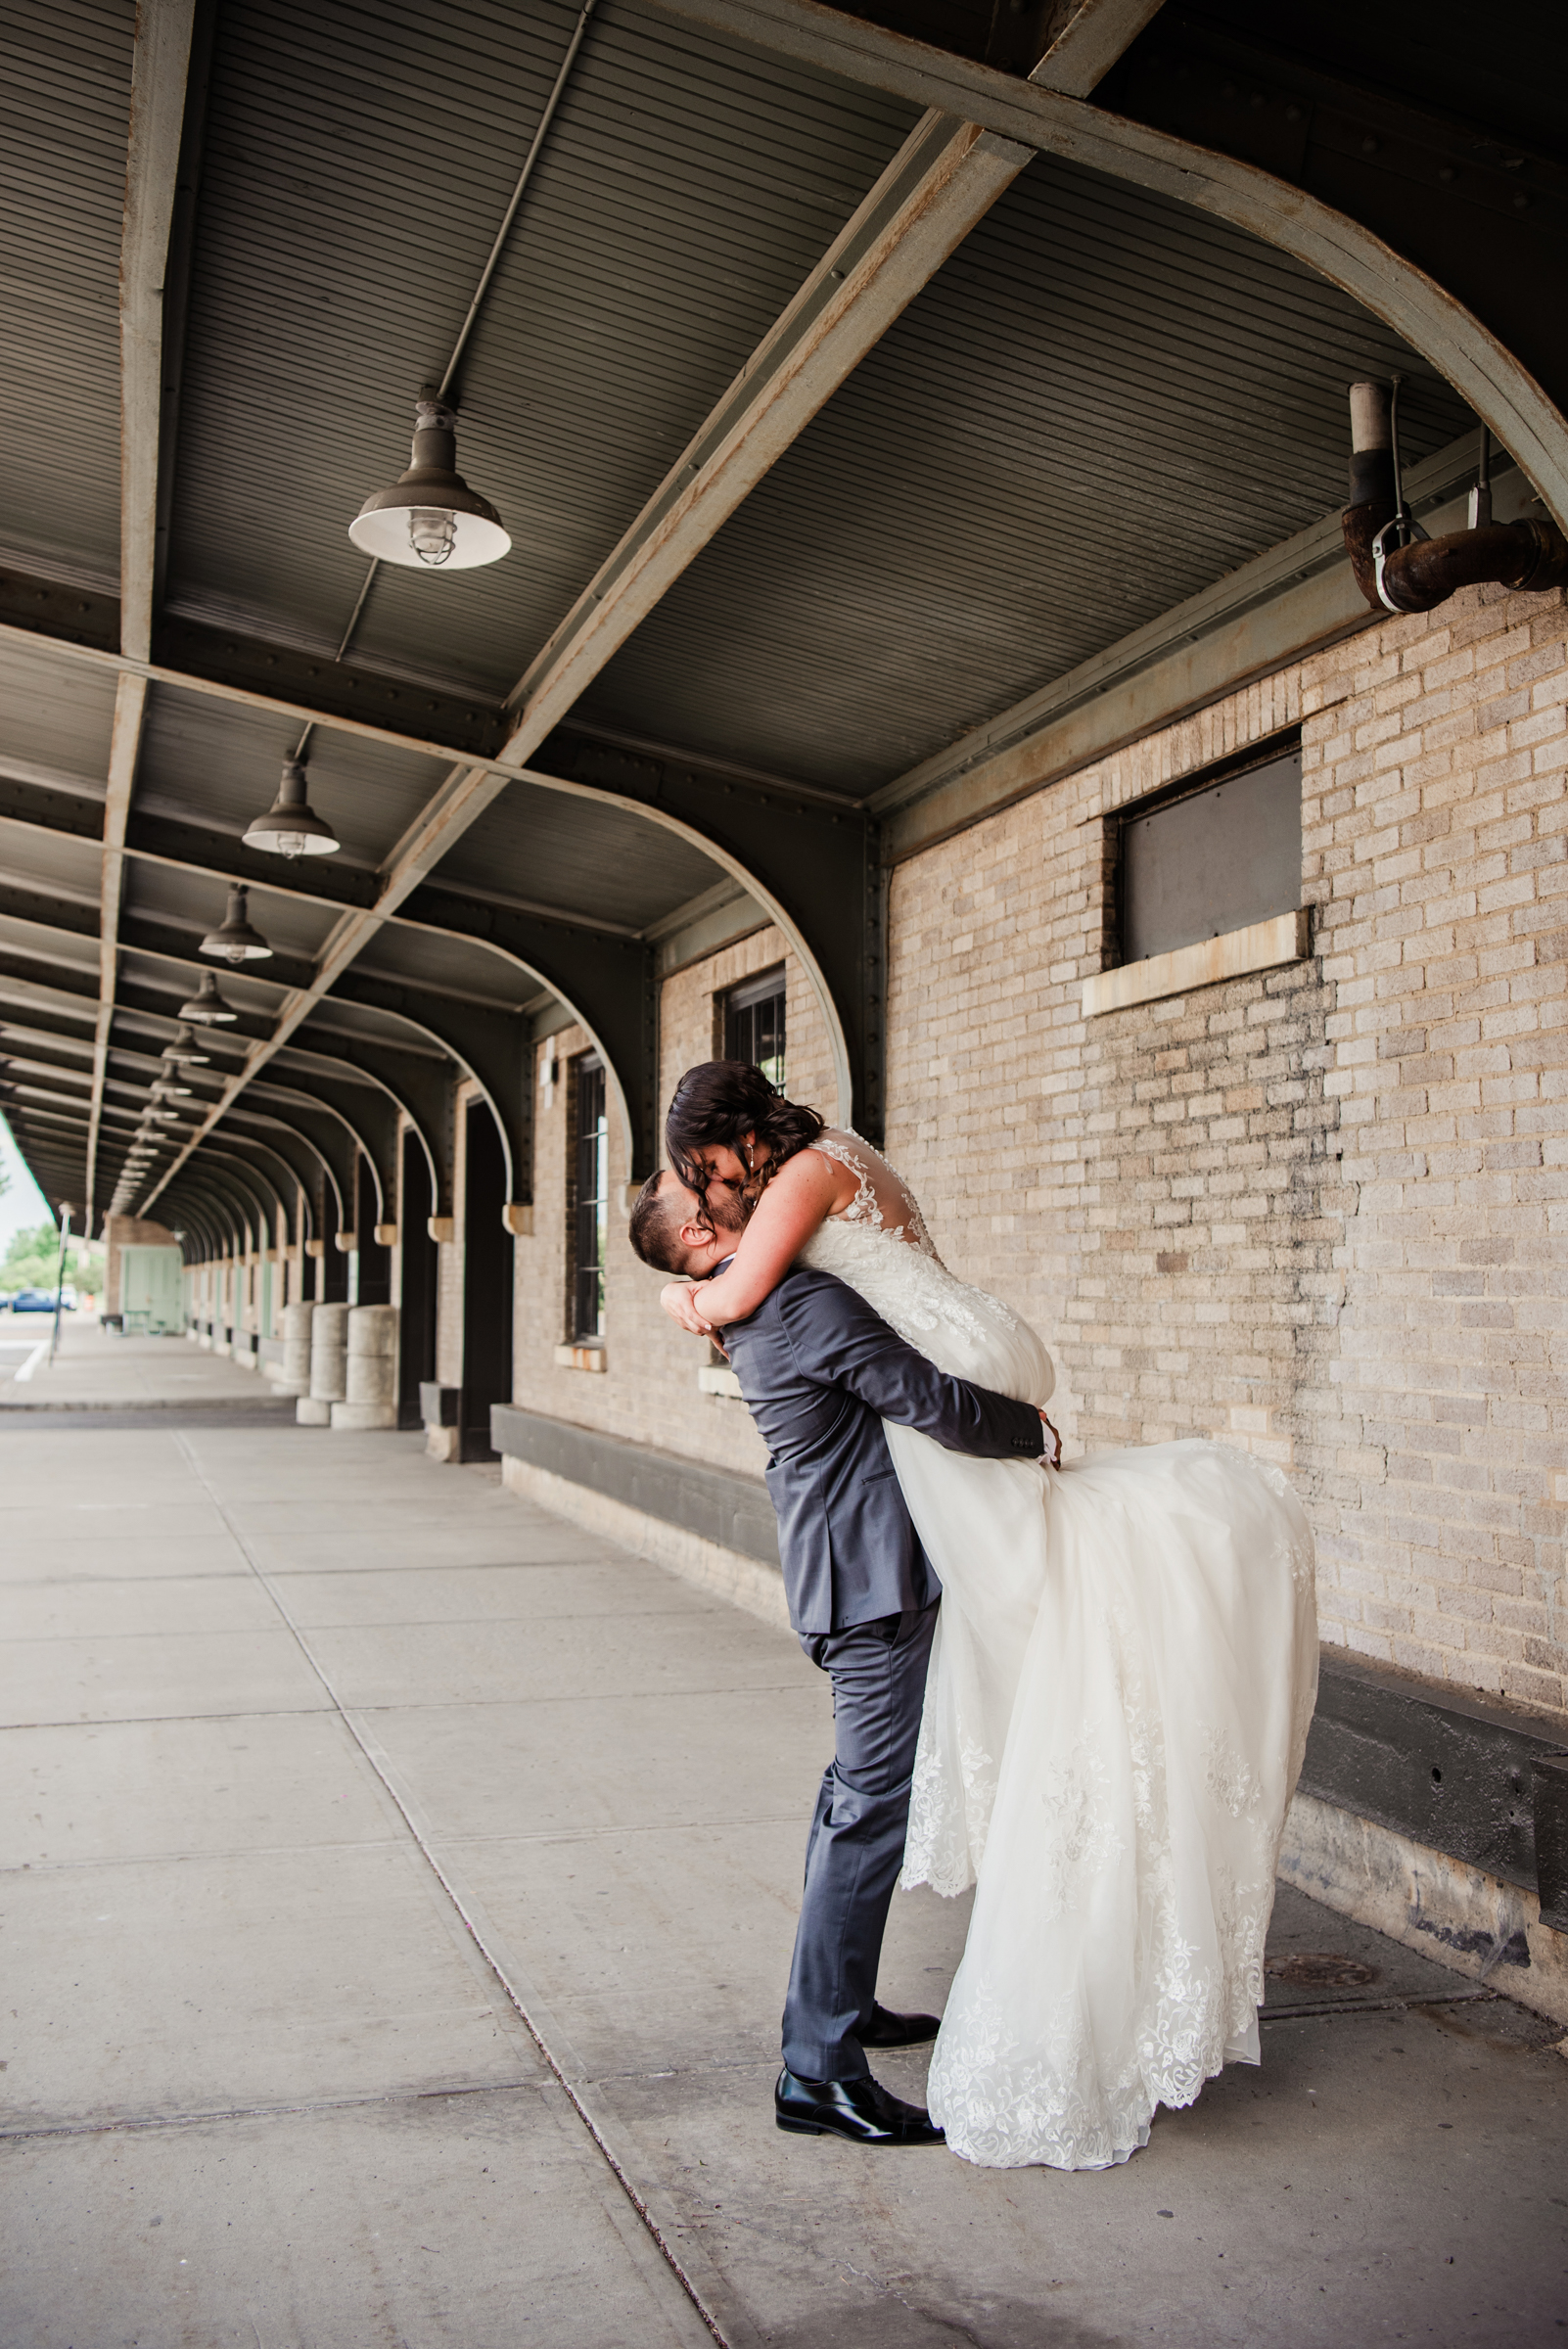 Historic_Old_St_Johns_Church_Valentinos_Banquet_Hall_Central_NY_Wedding_JILL_STUDIO_Rochester_NY_Photographer_DSC_6364.jpg